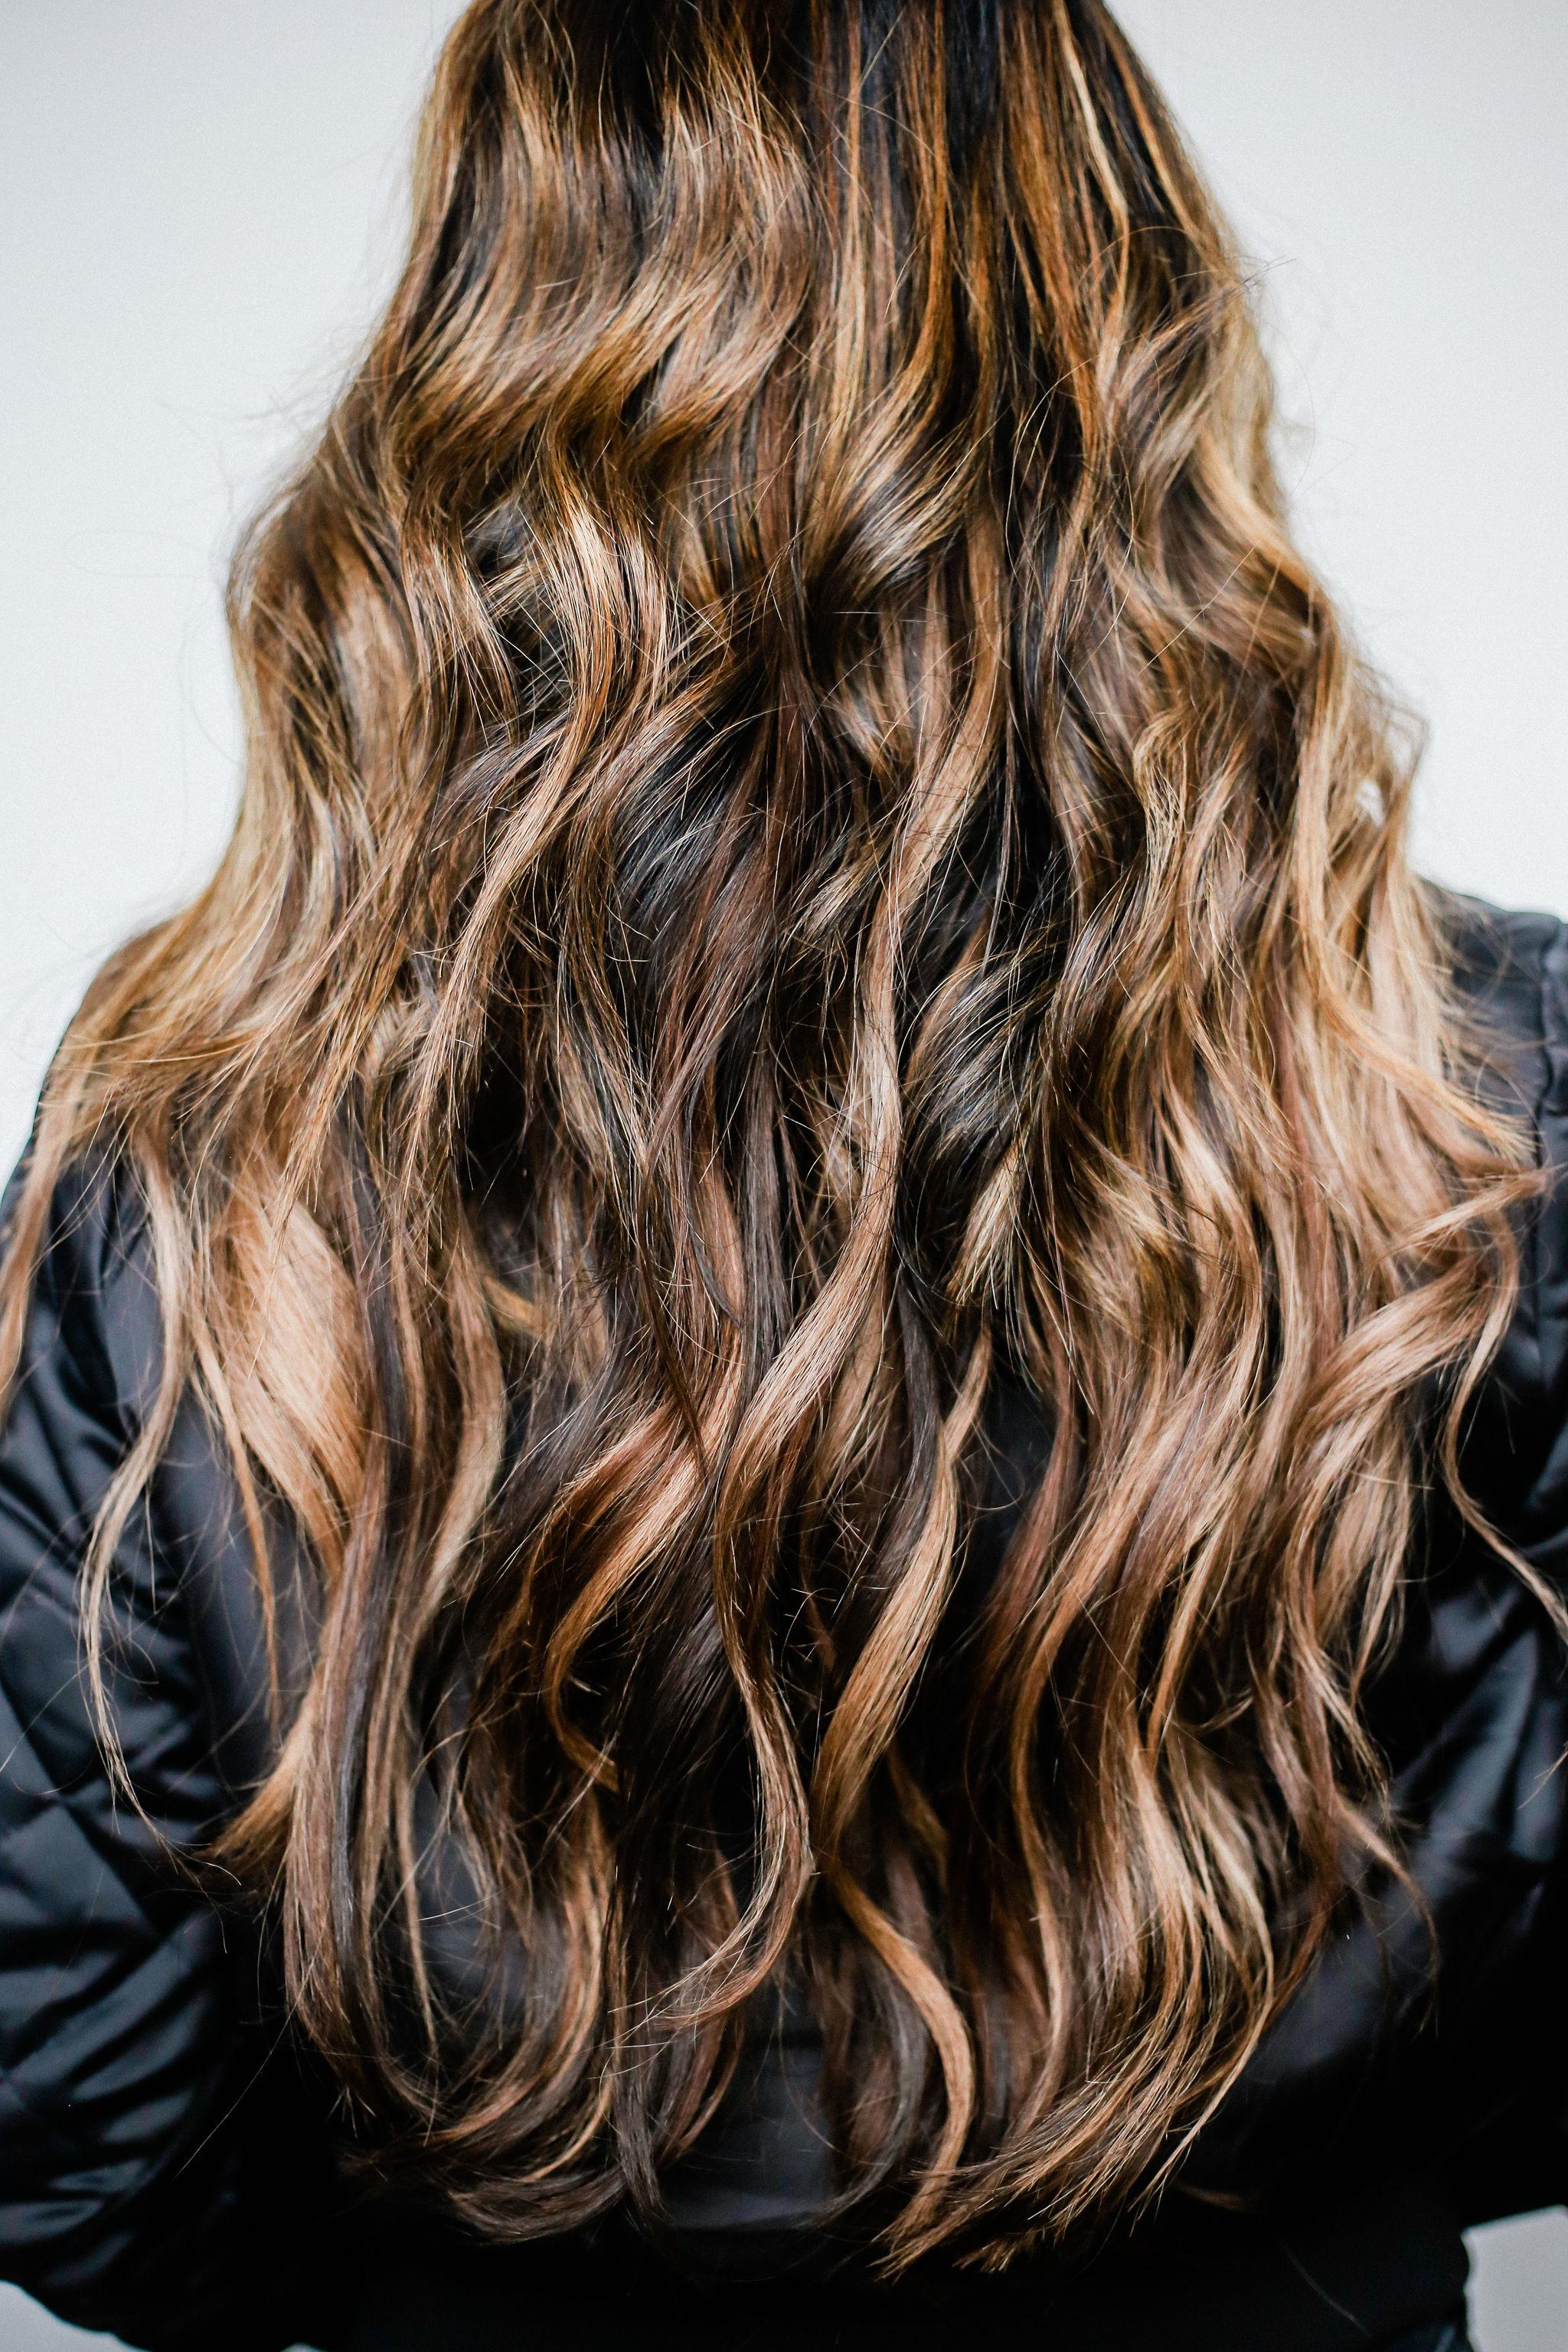 Best beach wave, beach wave style, how to do a beachy wave, victoria secret wavy hair, Jennifer worman